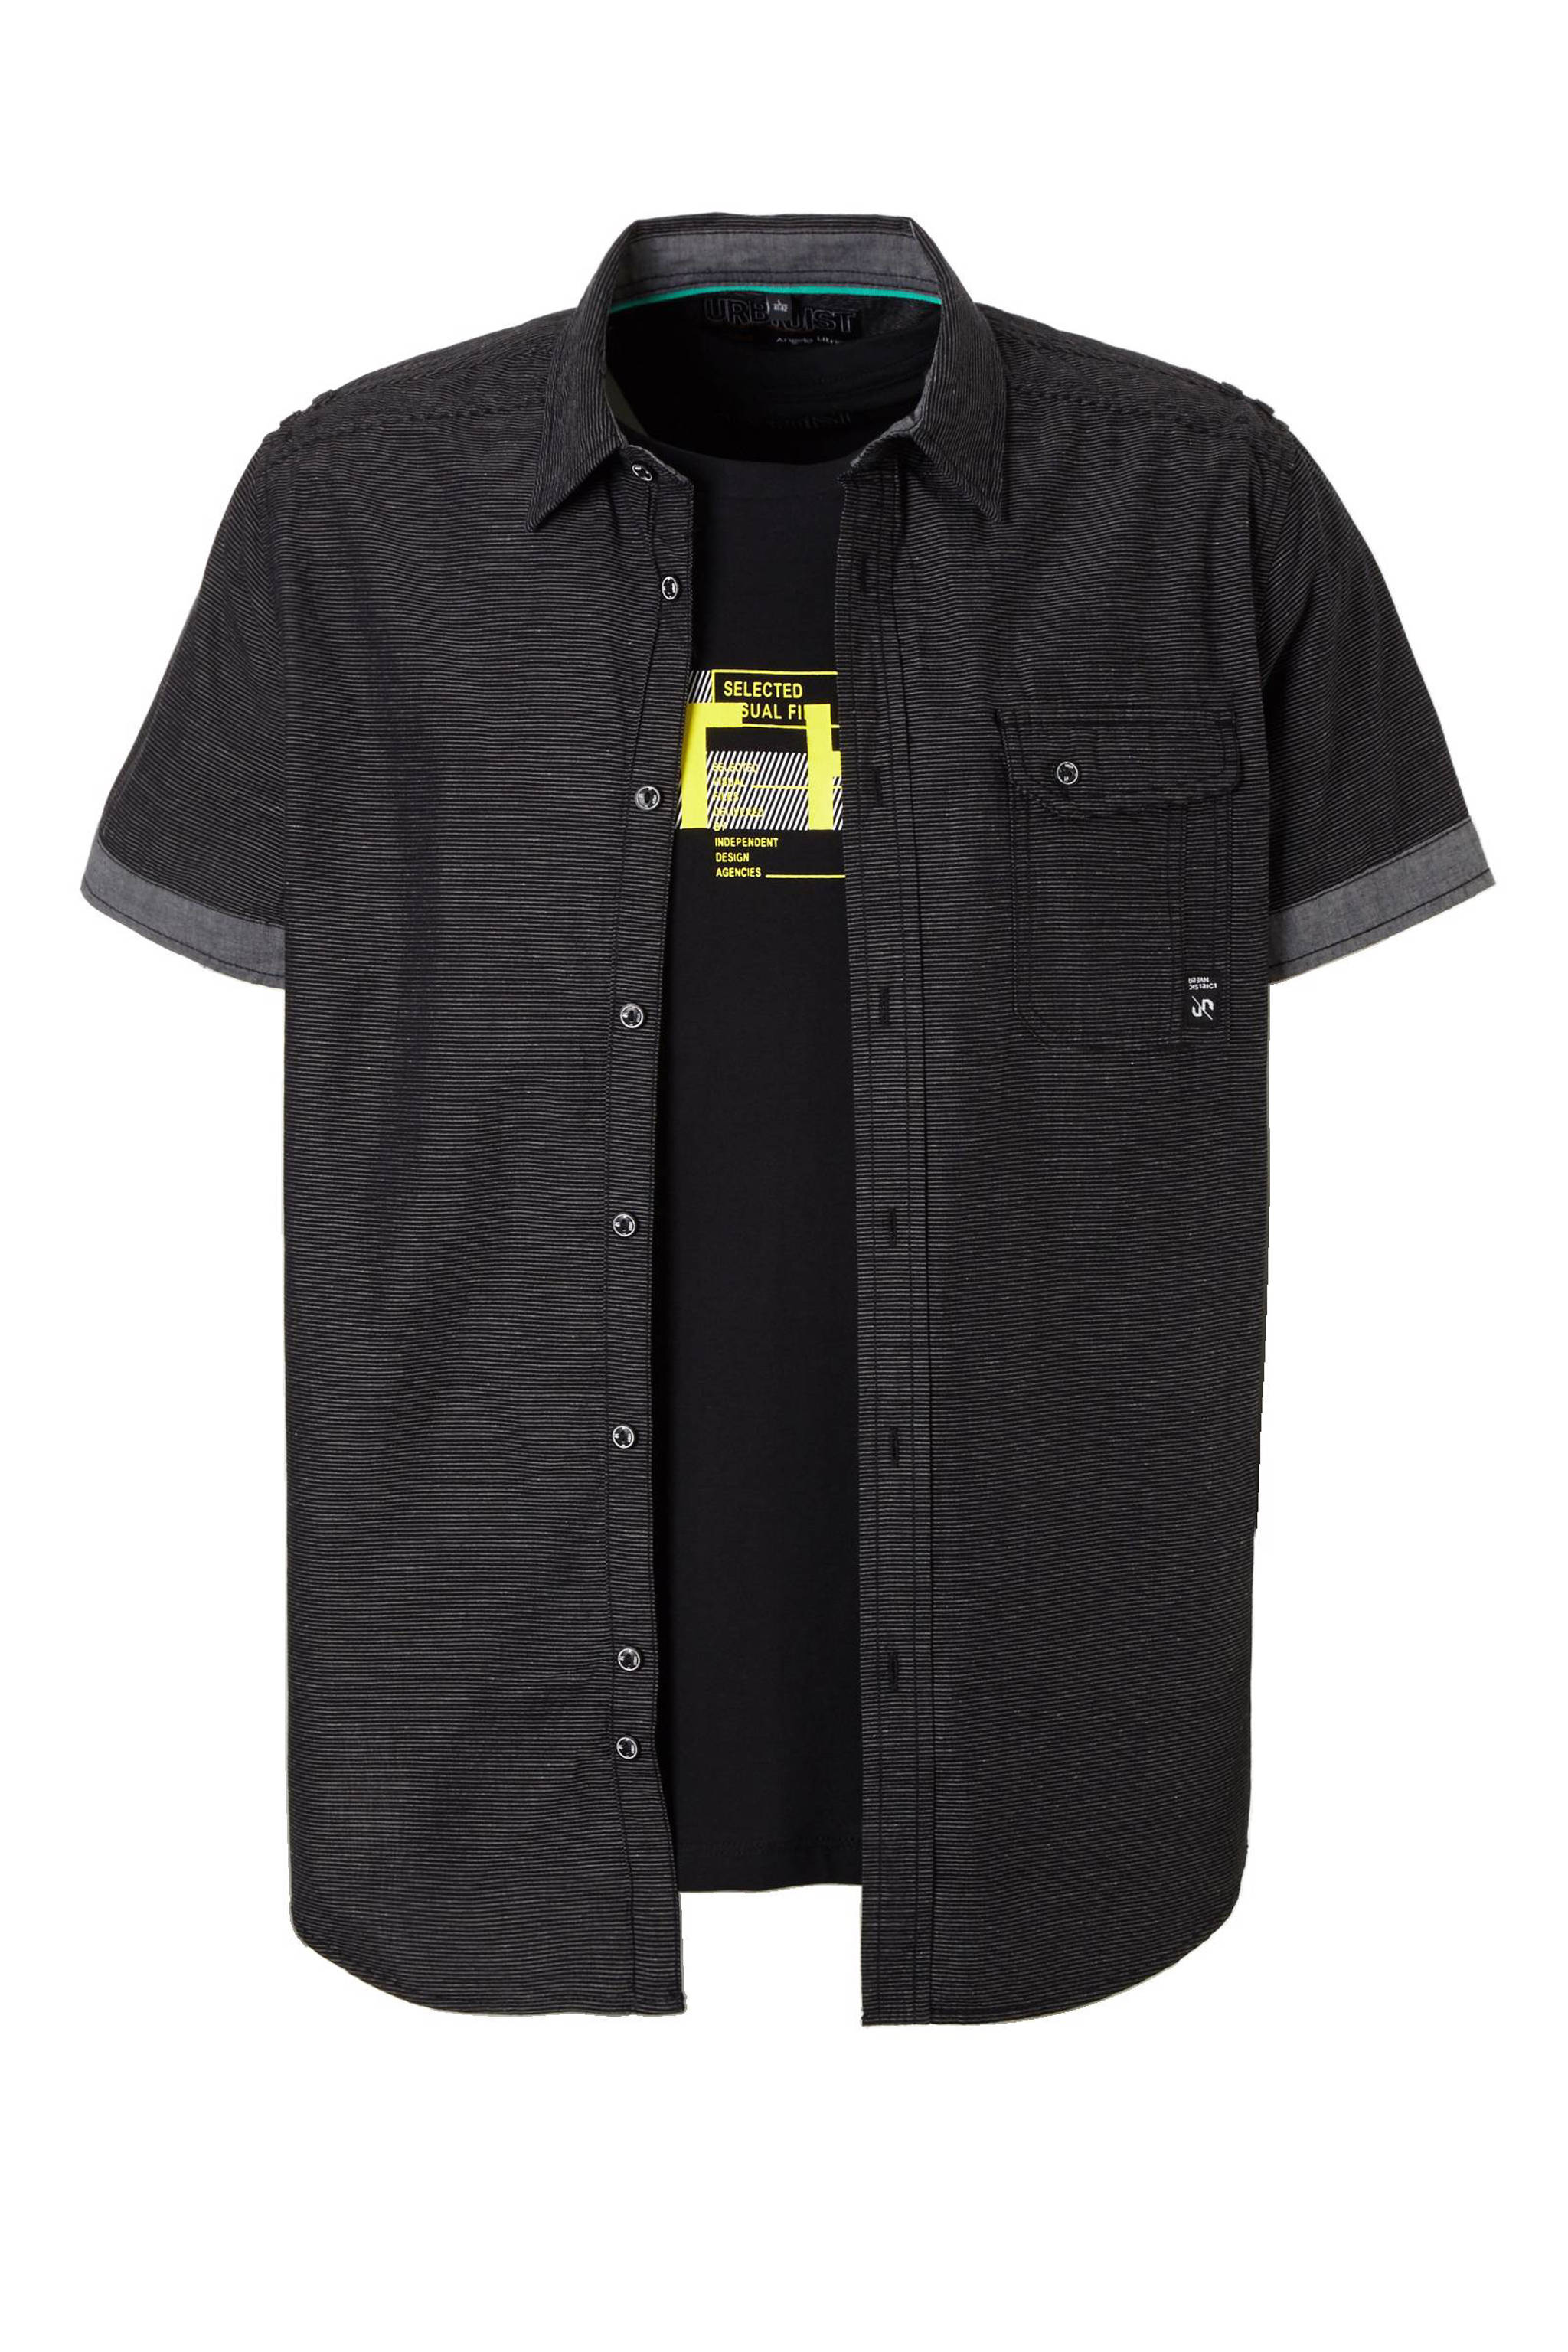 T Shirt Overhemd.C A Angelo Litrico T Shirt Overhemd Wehkamp